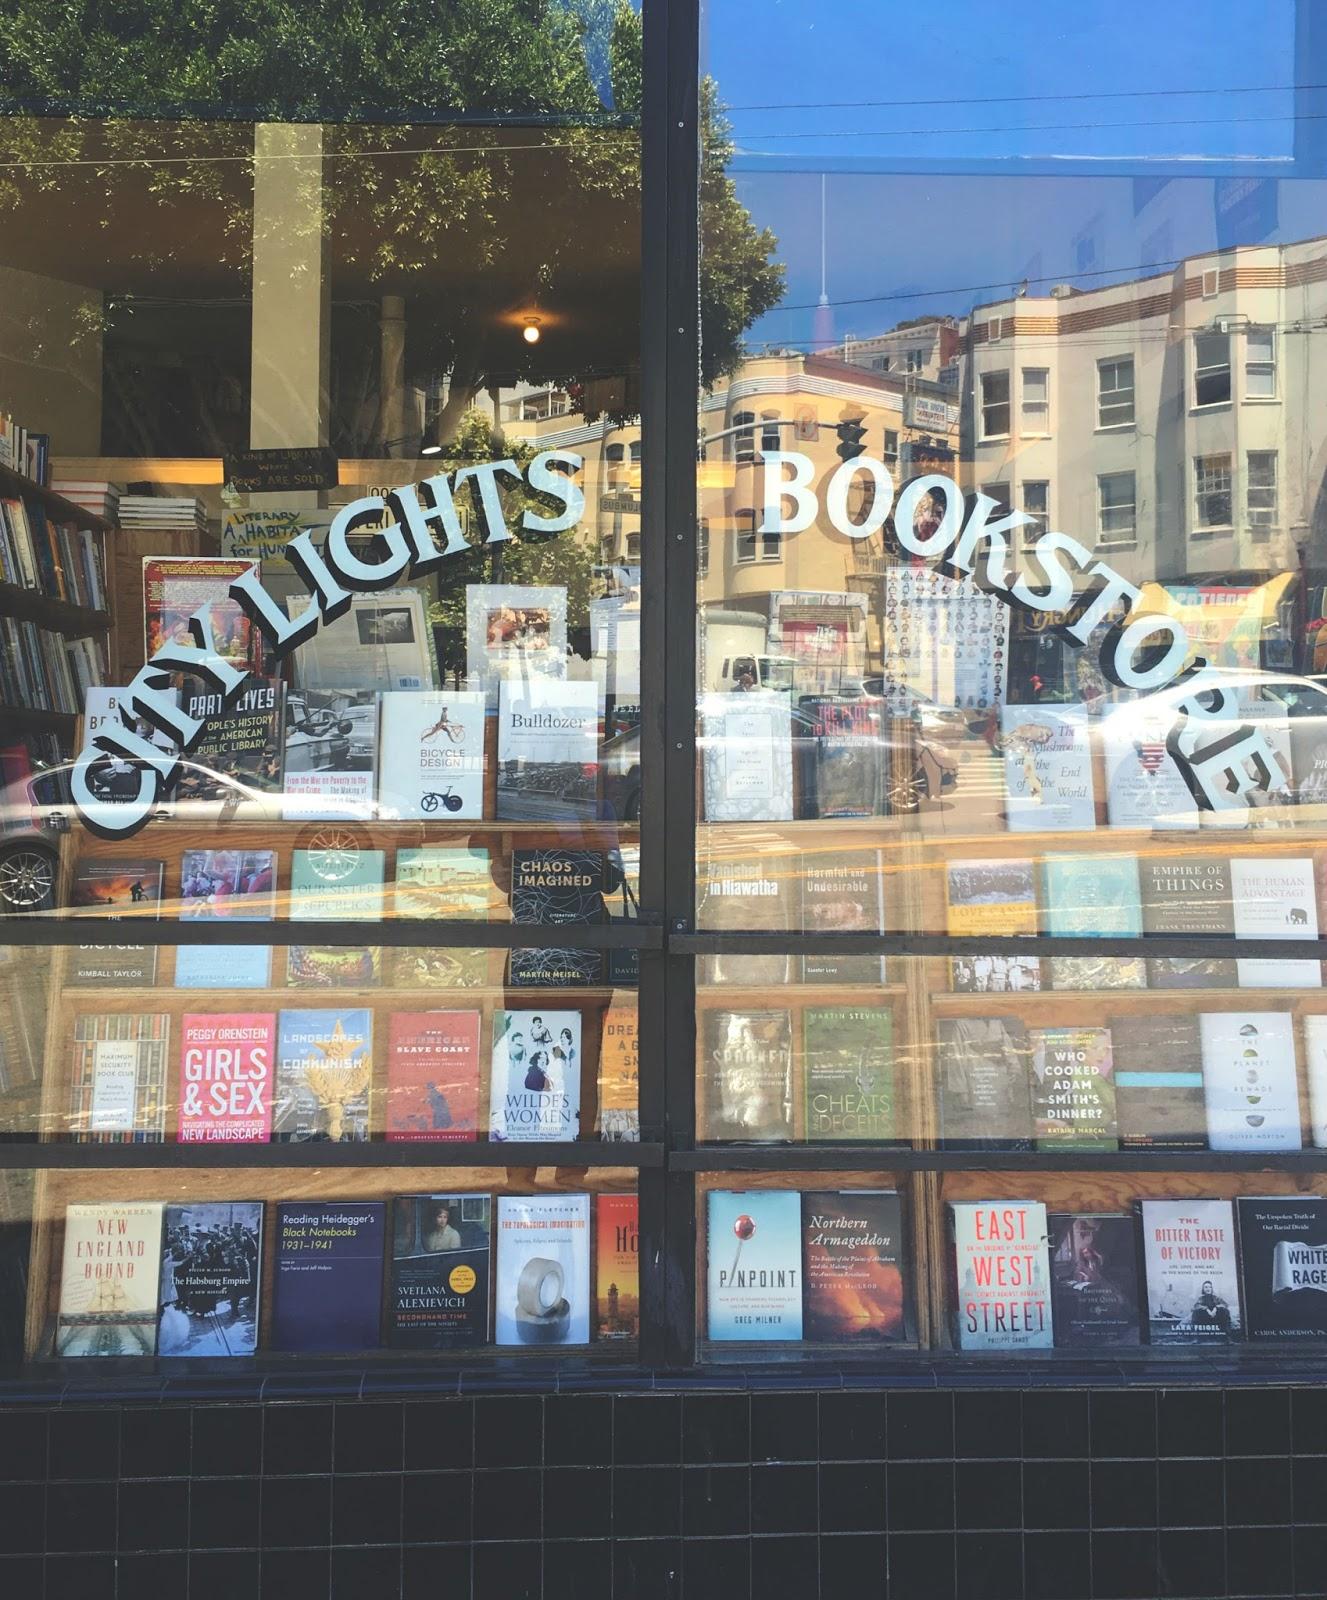 City Lights Book Store in San Francisco, California